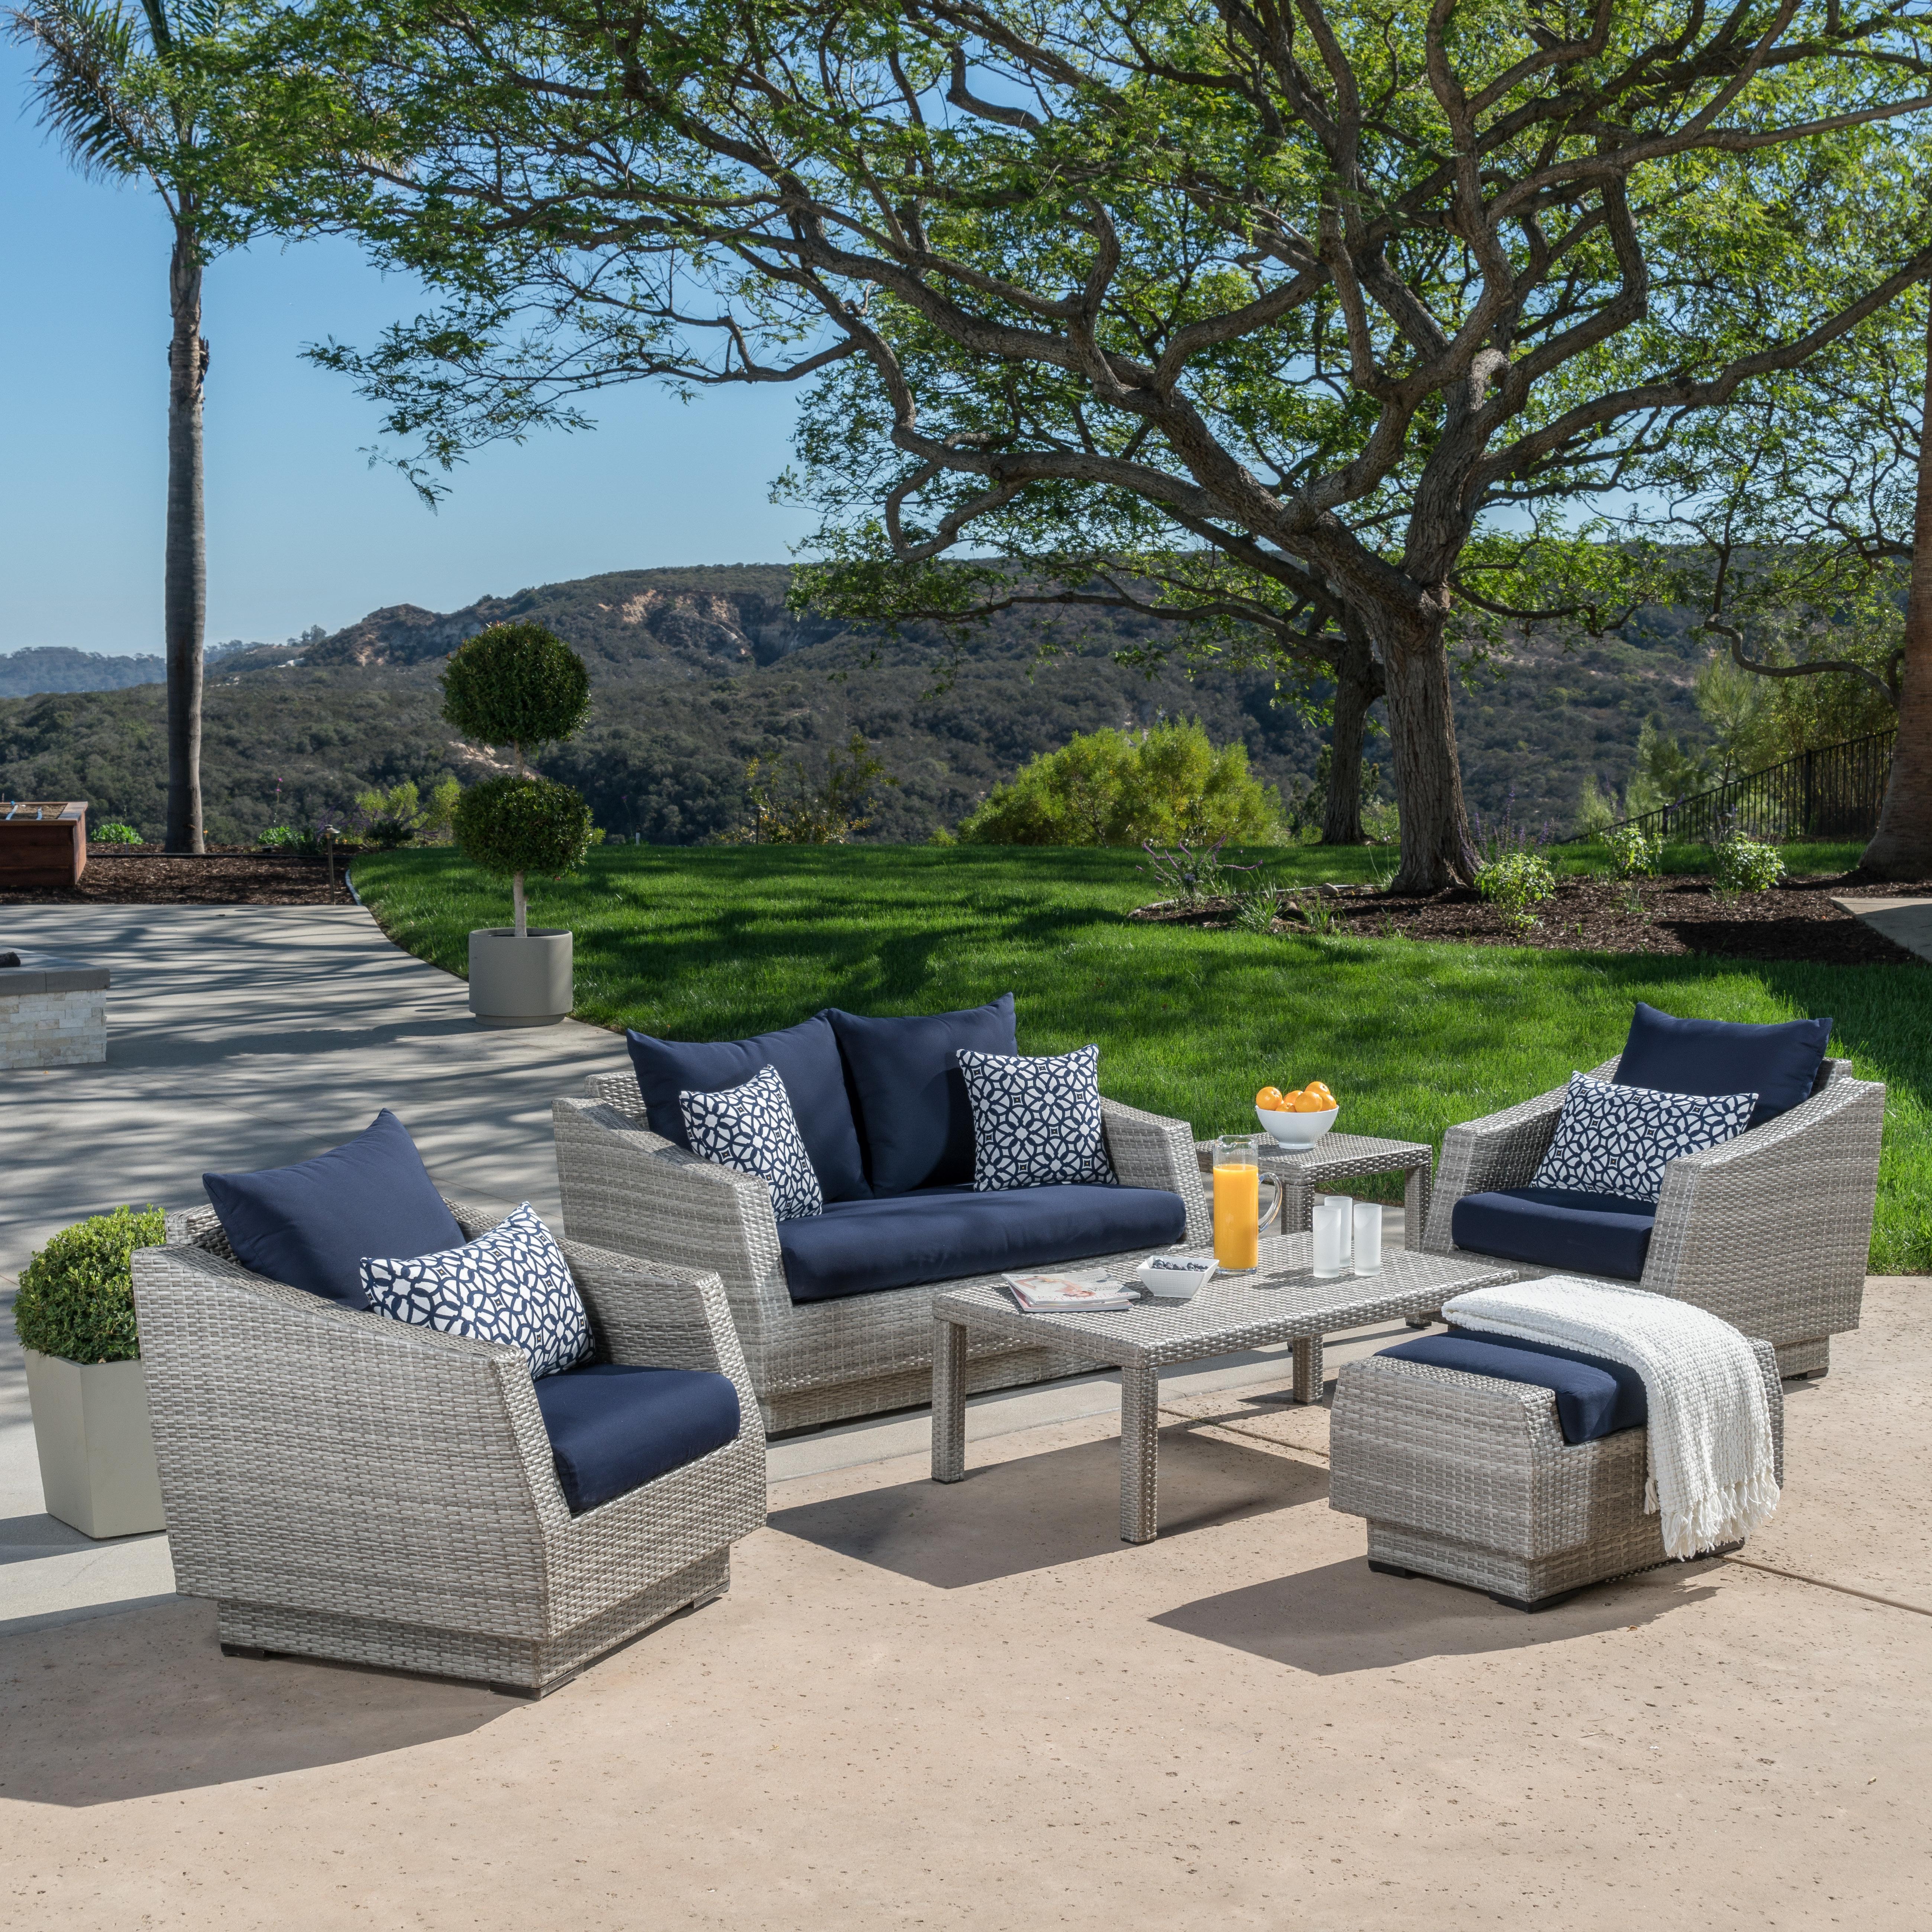 Castelli Patio Sofas With Sunbrella Cushions With Famous Castelli 6 Piece Sofa Set With Sunbrella Cushions (View 9 of 20)